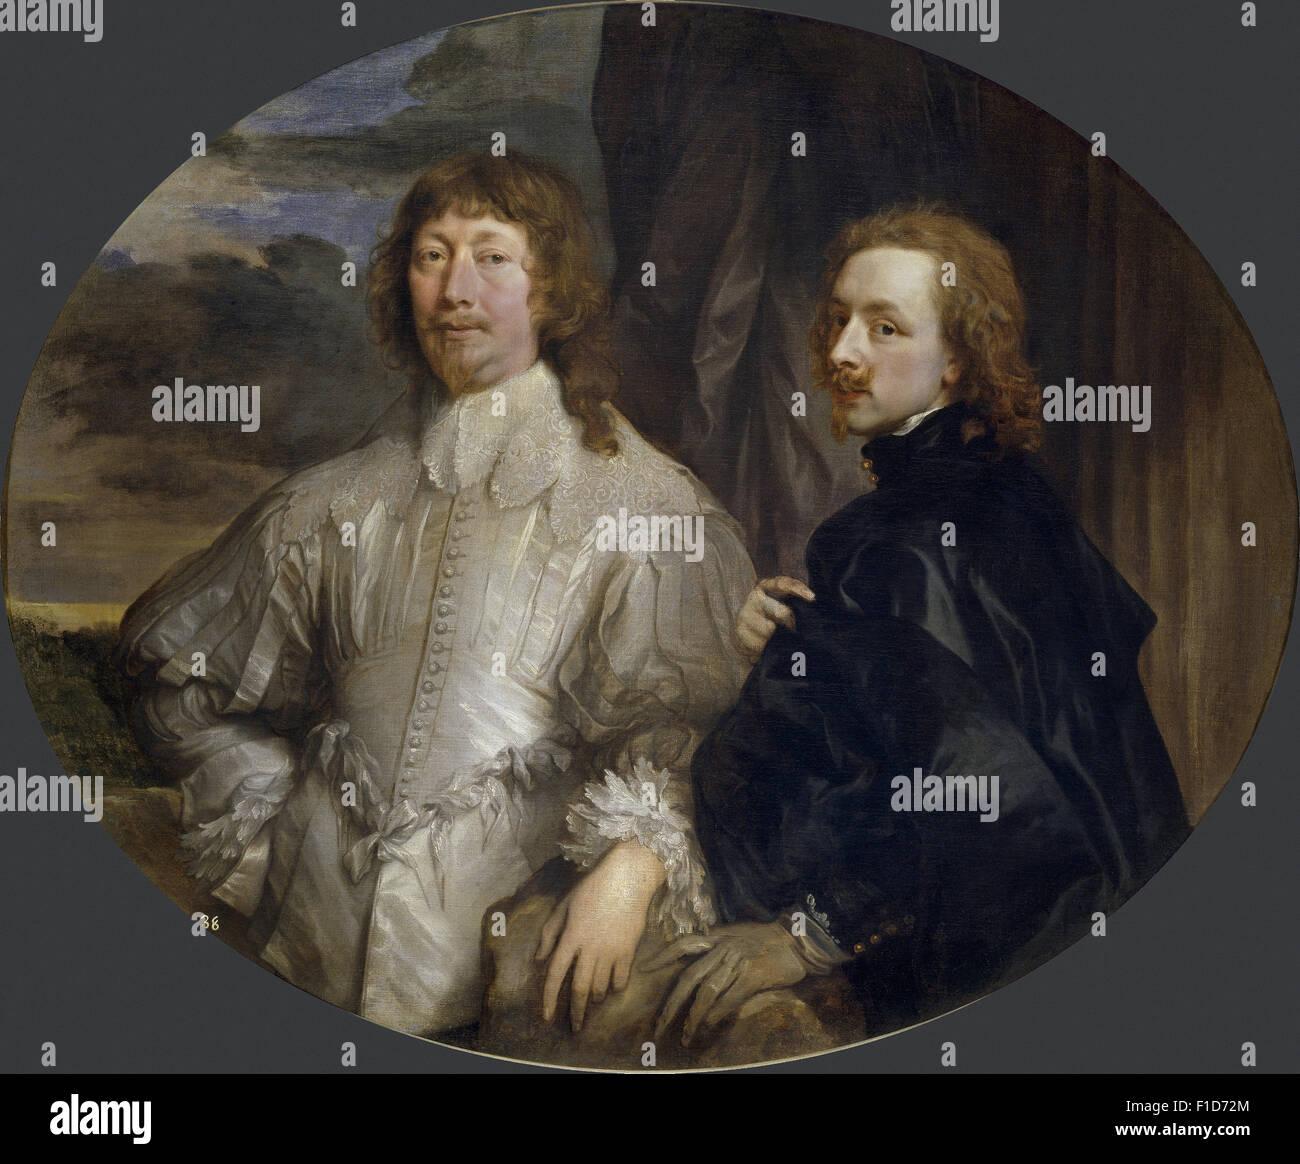 Anthony Van Dyck - Sir Endymion Porter and Anton van Dyck - Stock Image